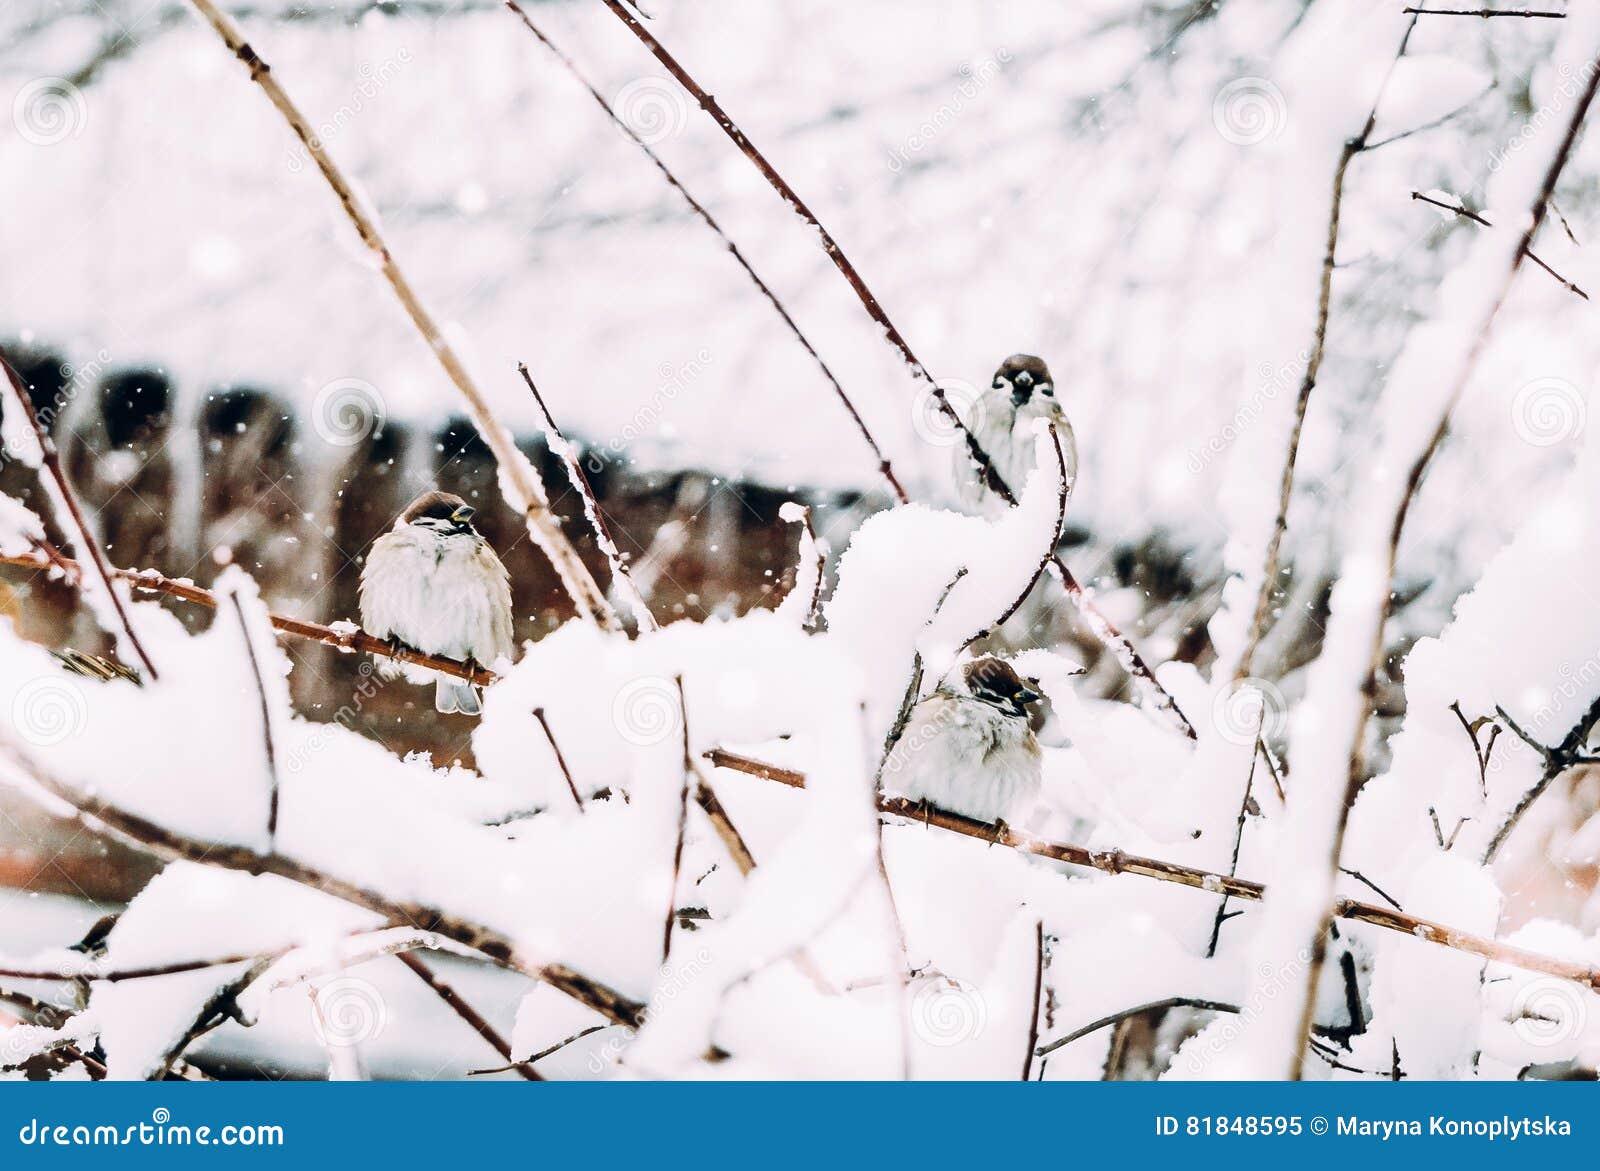 fun in the snow a flock of sparrows in winter garden stock photo